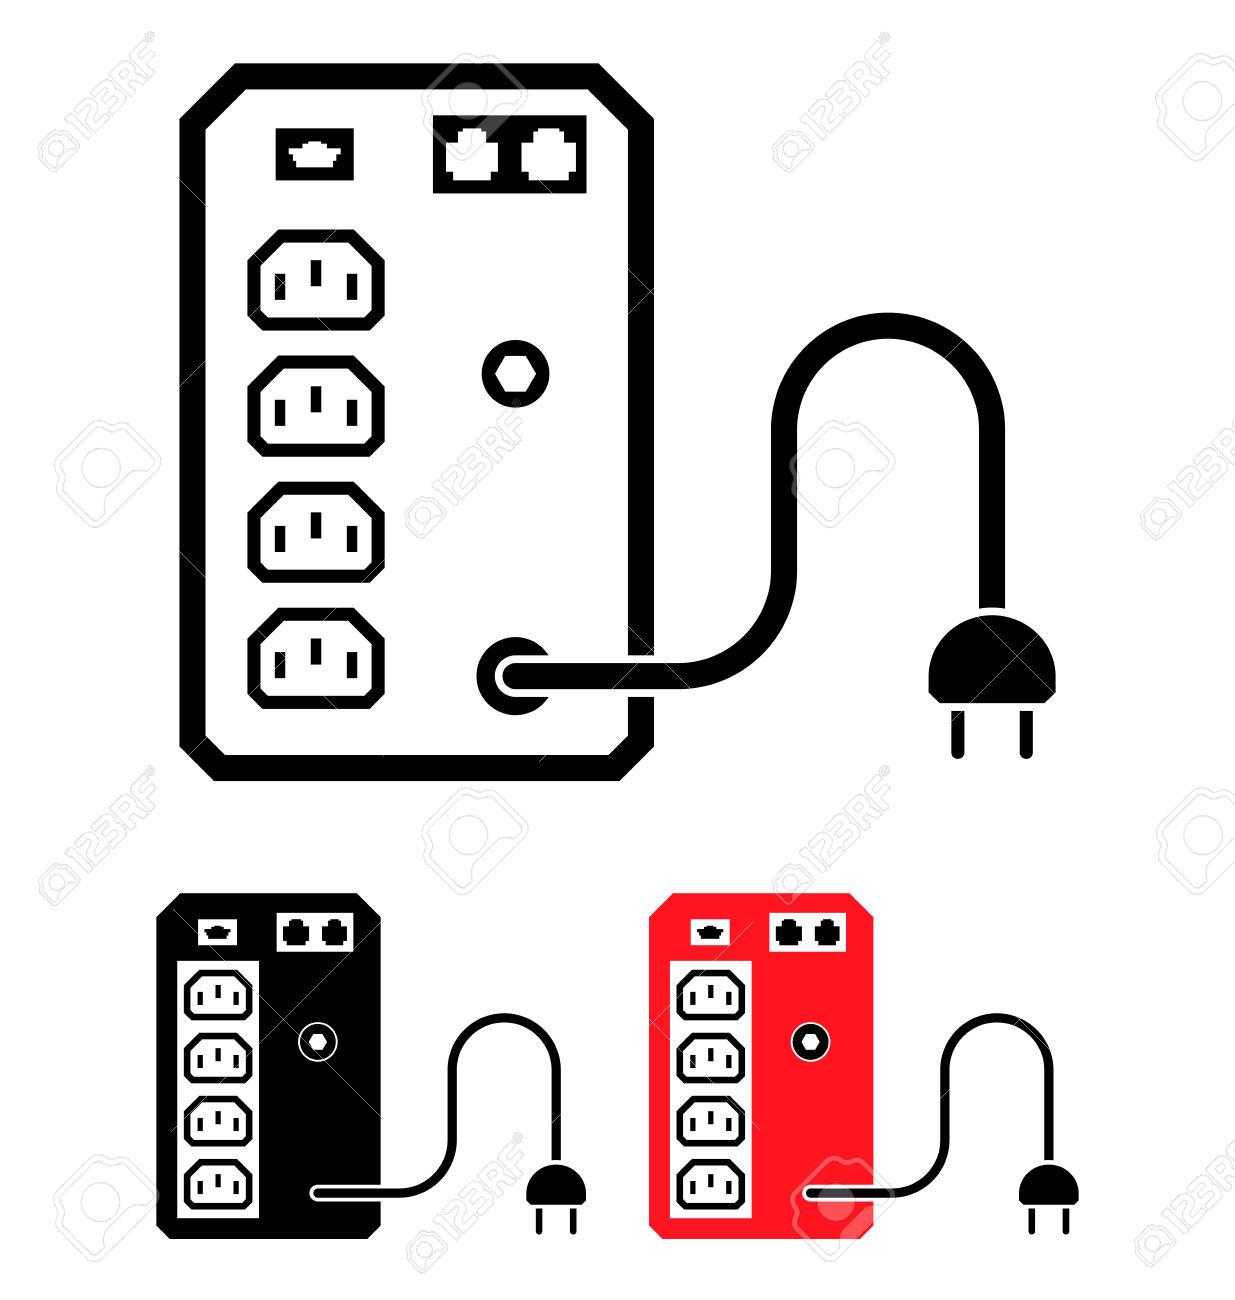 uninterruptible power supply clipart